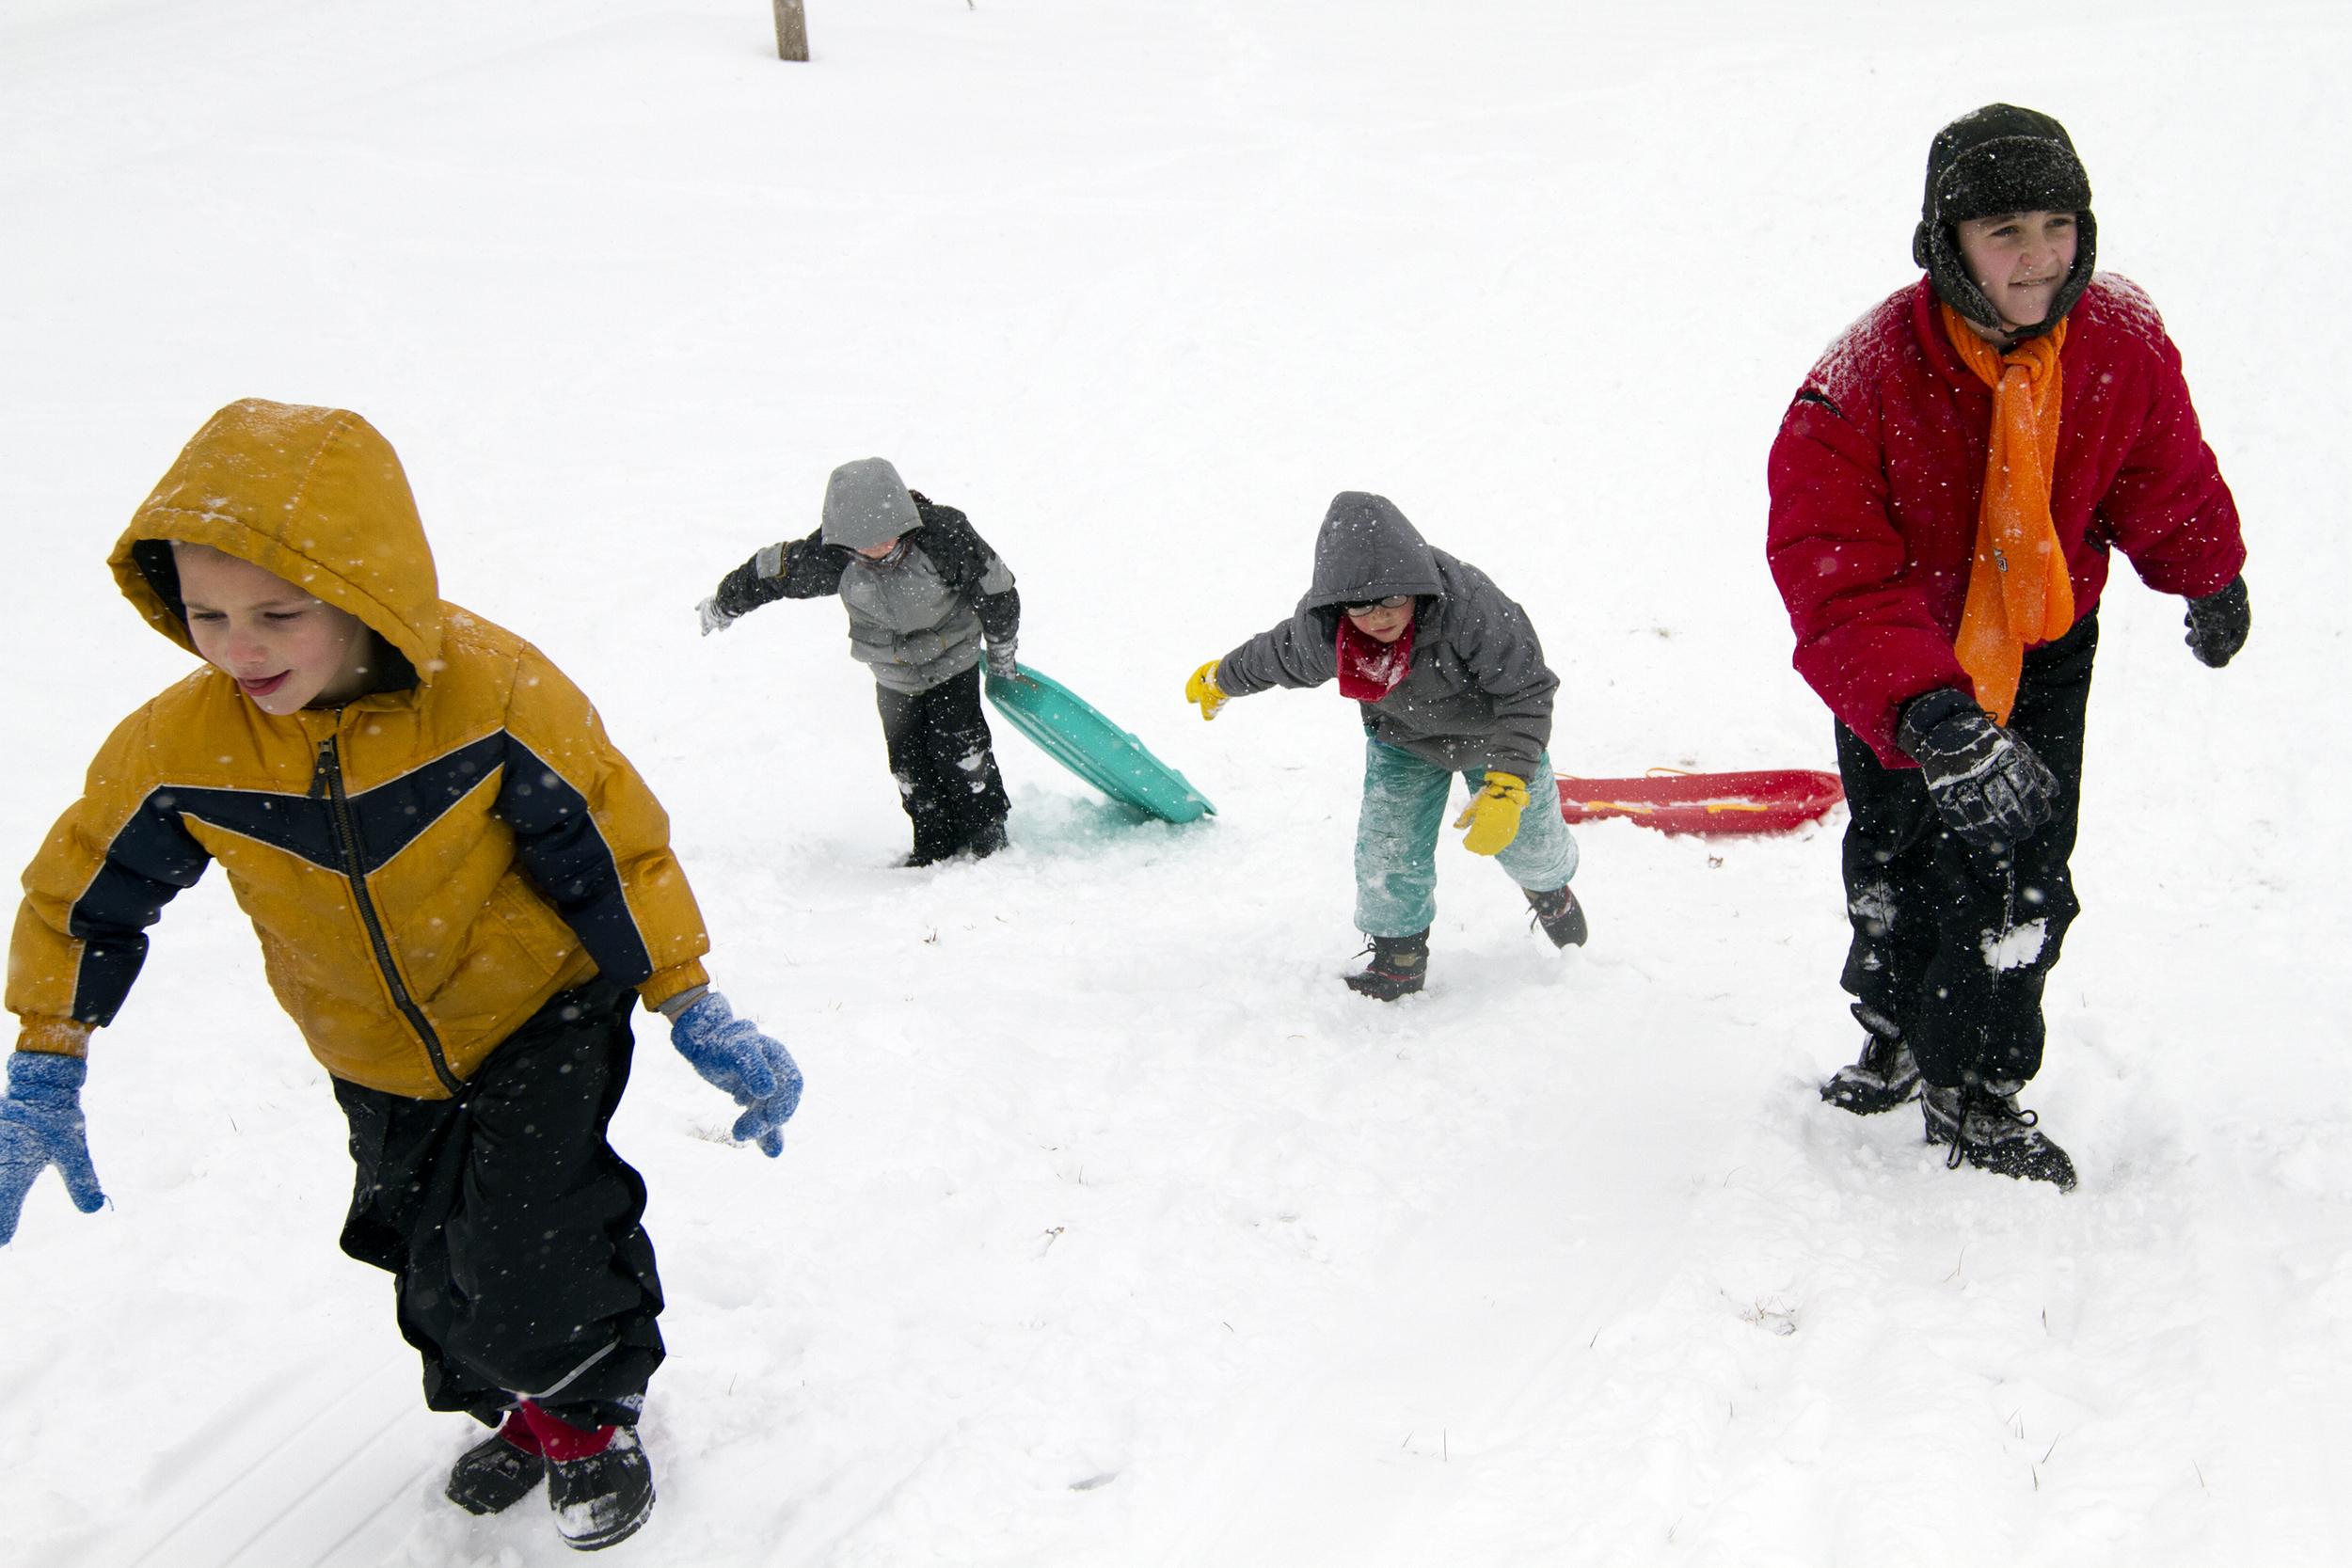 150216_snowday01_Av.jpg